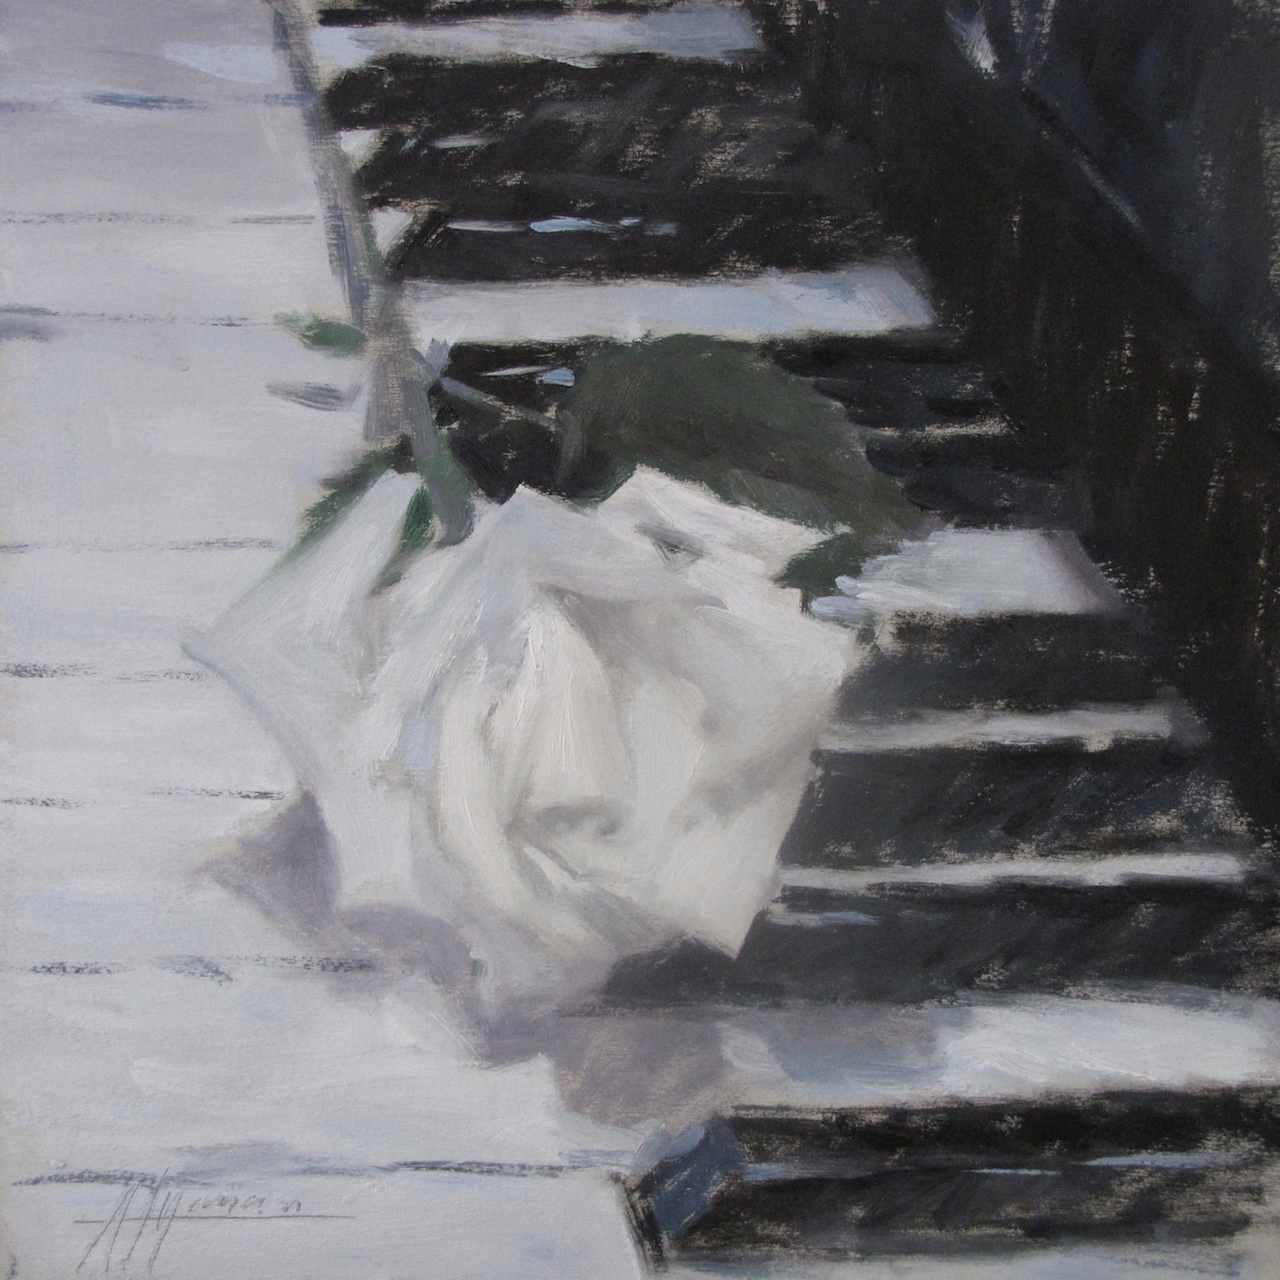 Rosa bianca, Andrea Mancini 2011 - olio su tavola, 25x25 cm